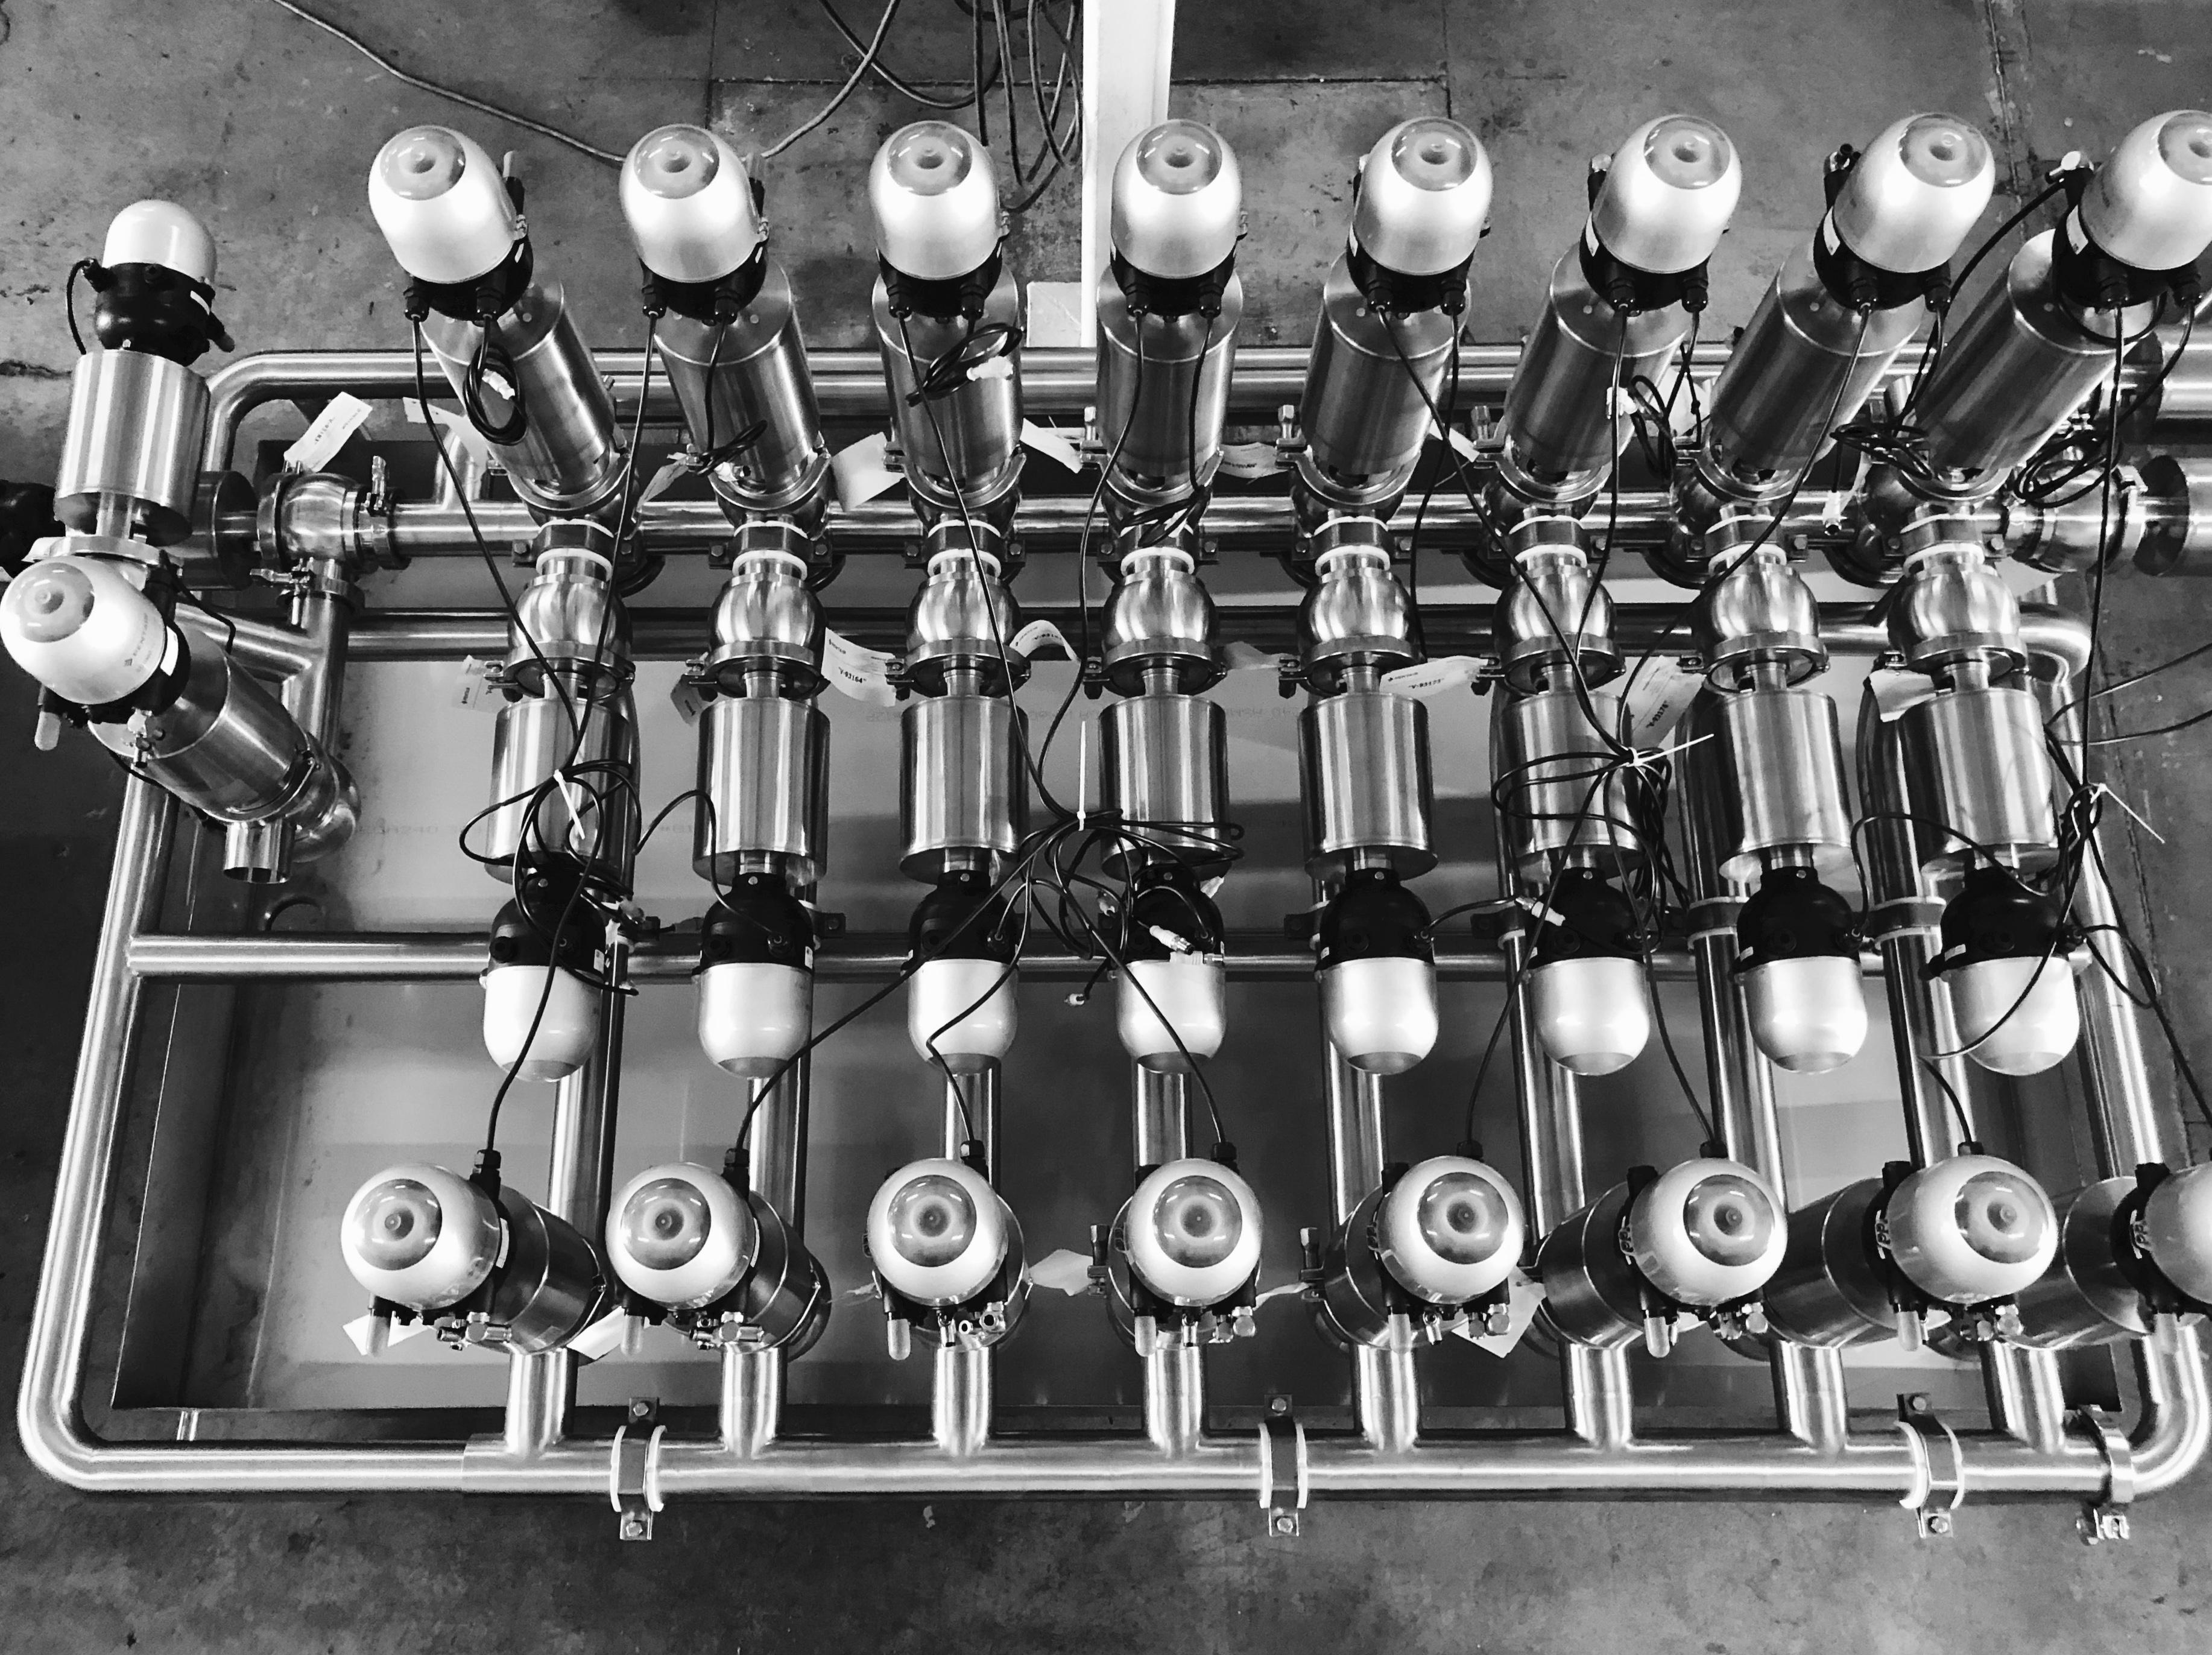 Valve Group/Manifold/Skid Fabrication